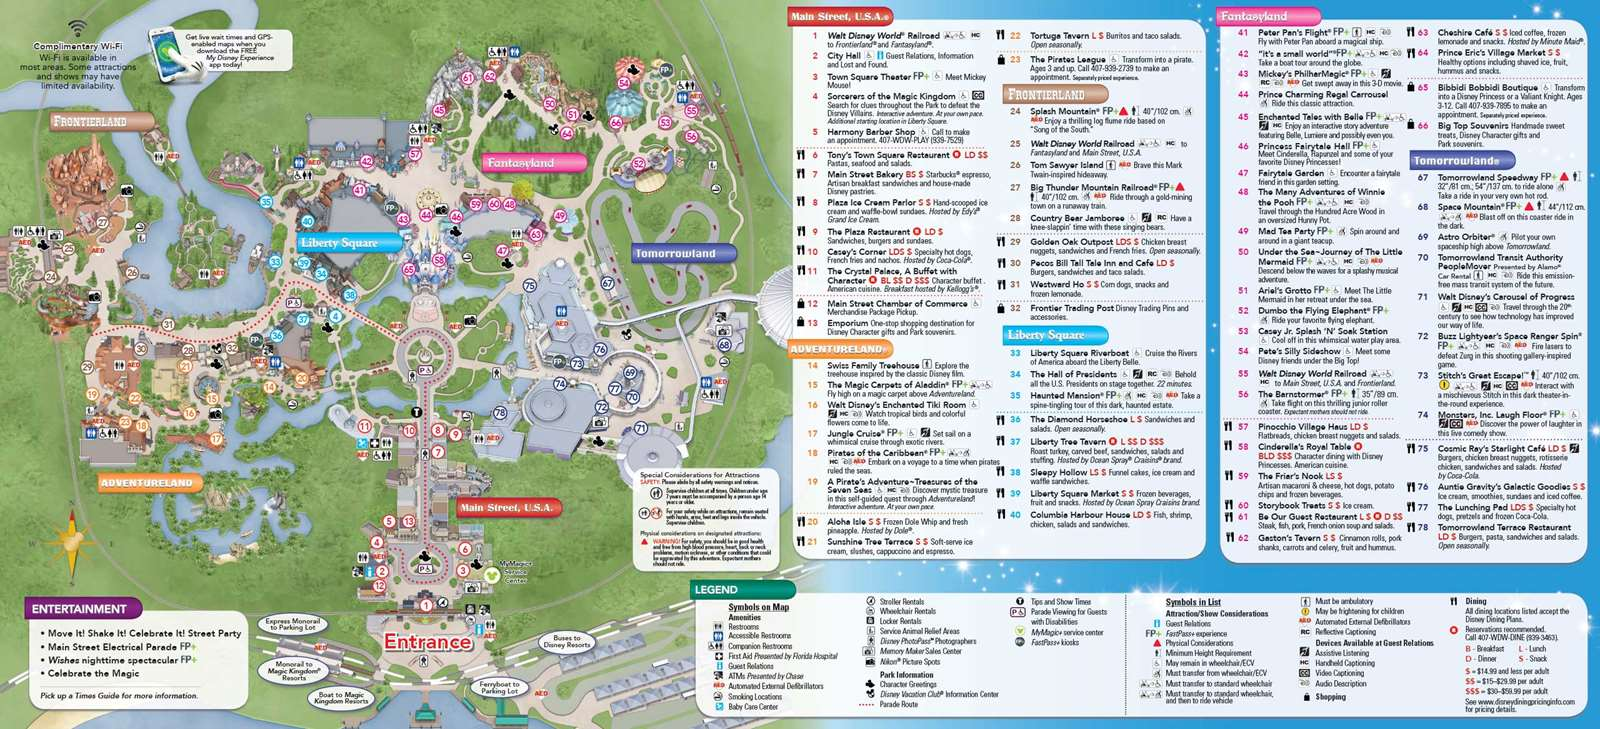 Adventureland Disney World Map.2014 Walt Disney World Park Maps With Fastpass Photo 6 Of 8